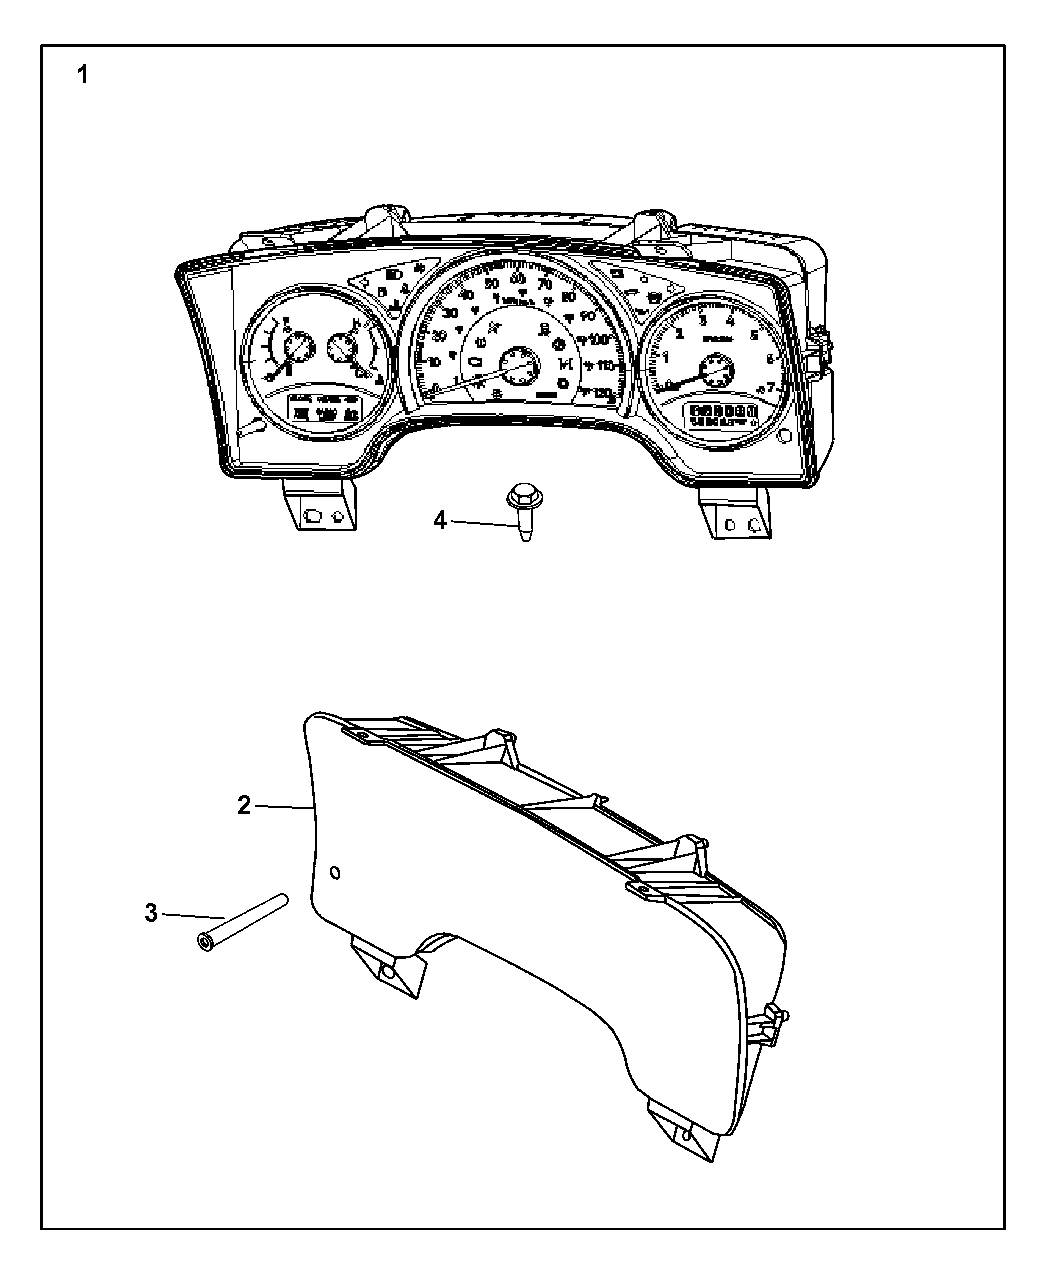 Wiring Diagram Database: 2006 Dodge Dakota Exhaust System